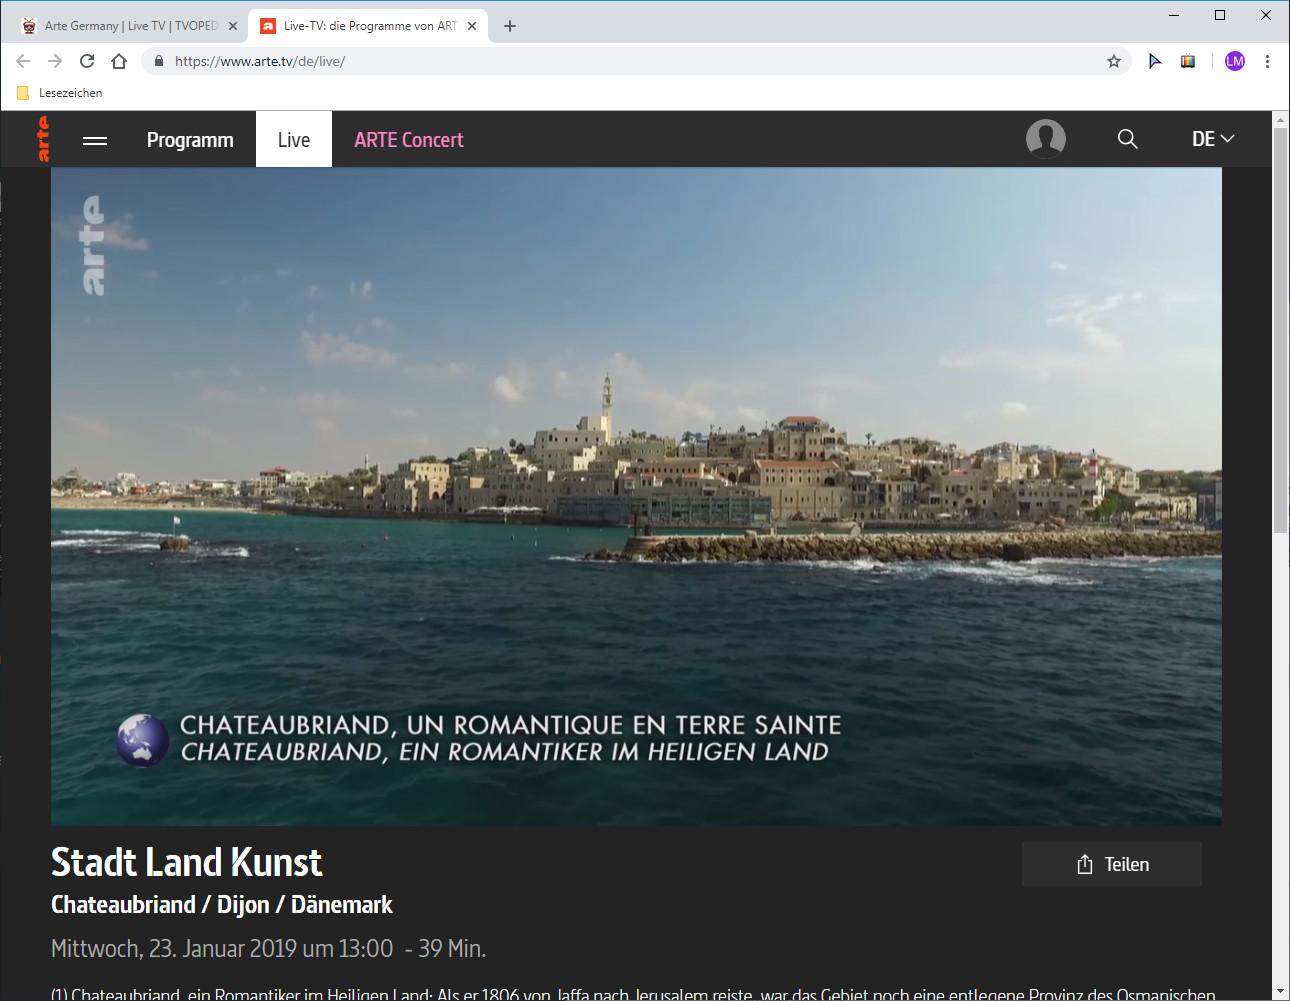 Screenshot 1 - TV für Google Chrome